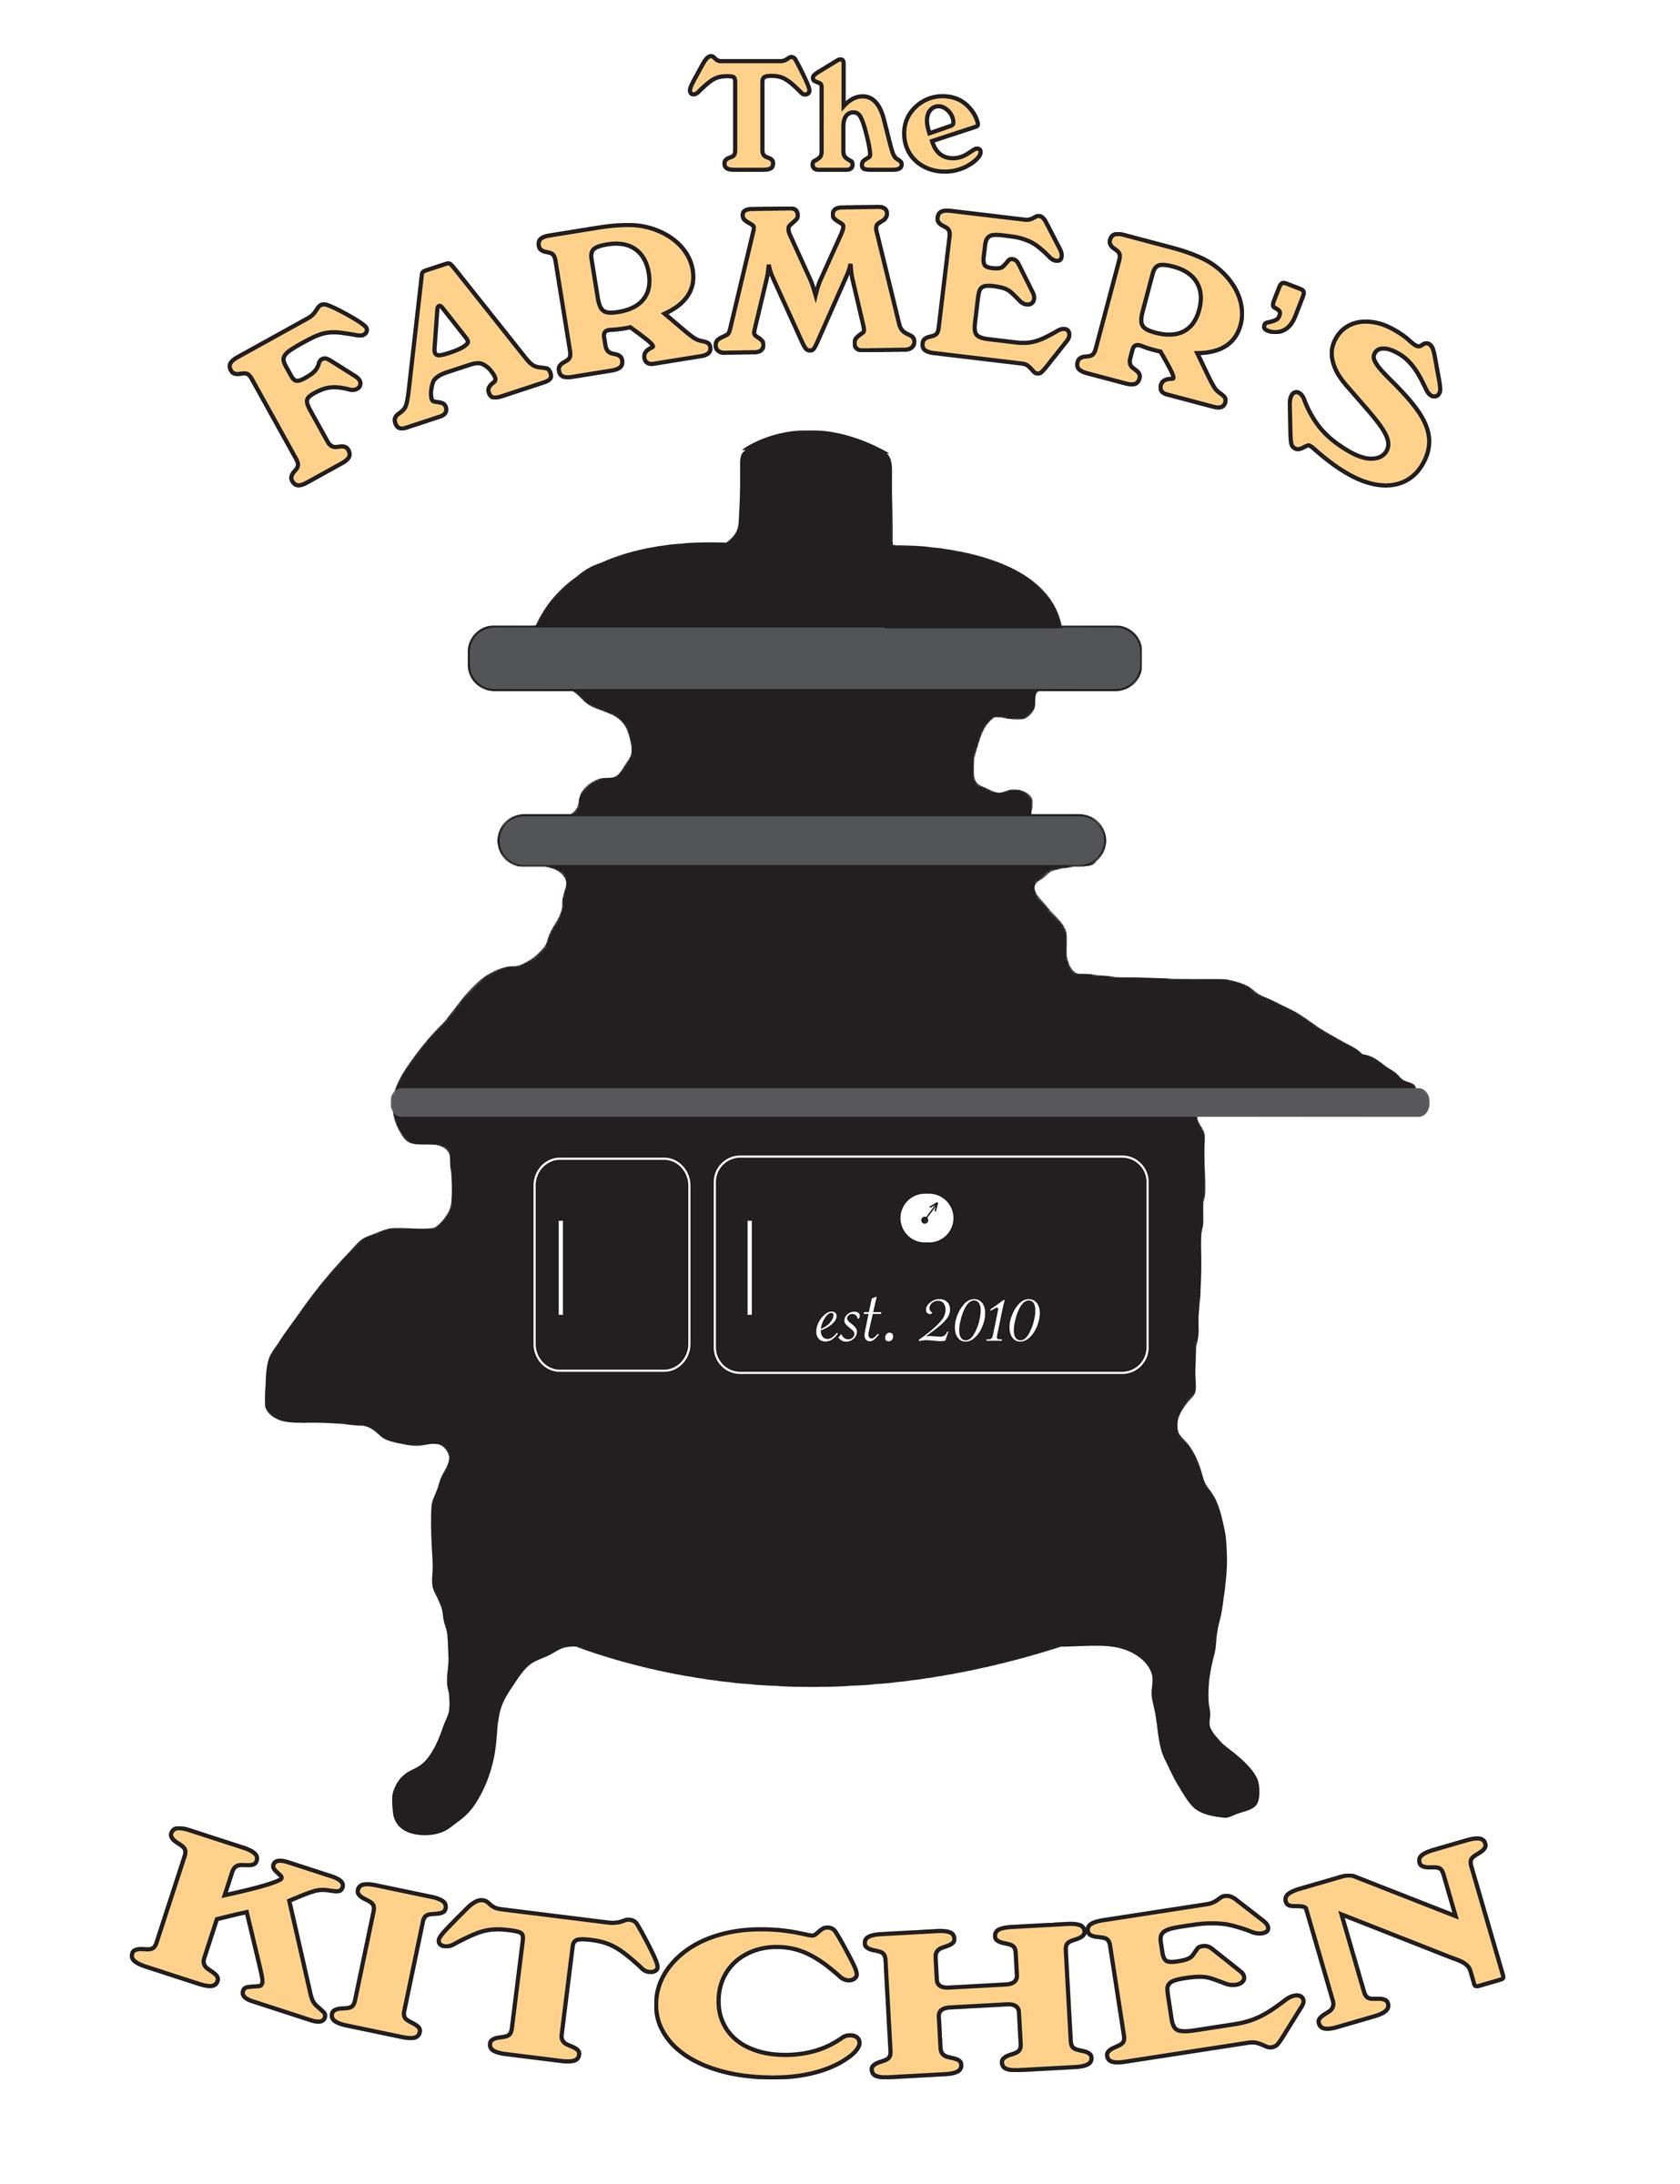 The Farmer S Kitchen  Nh  Farmington Nh